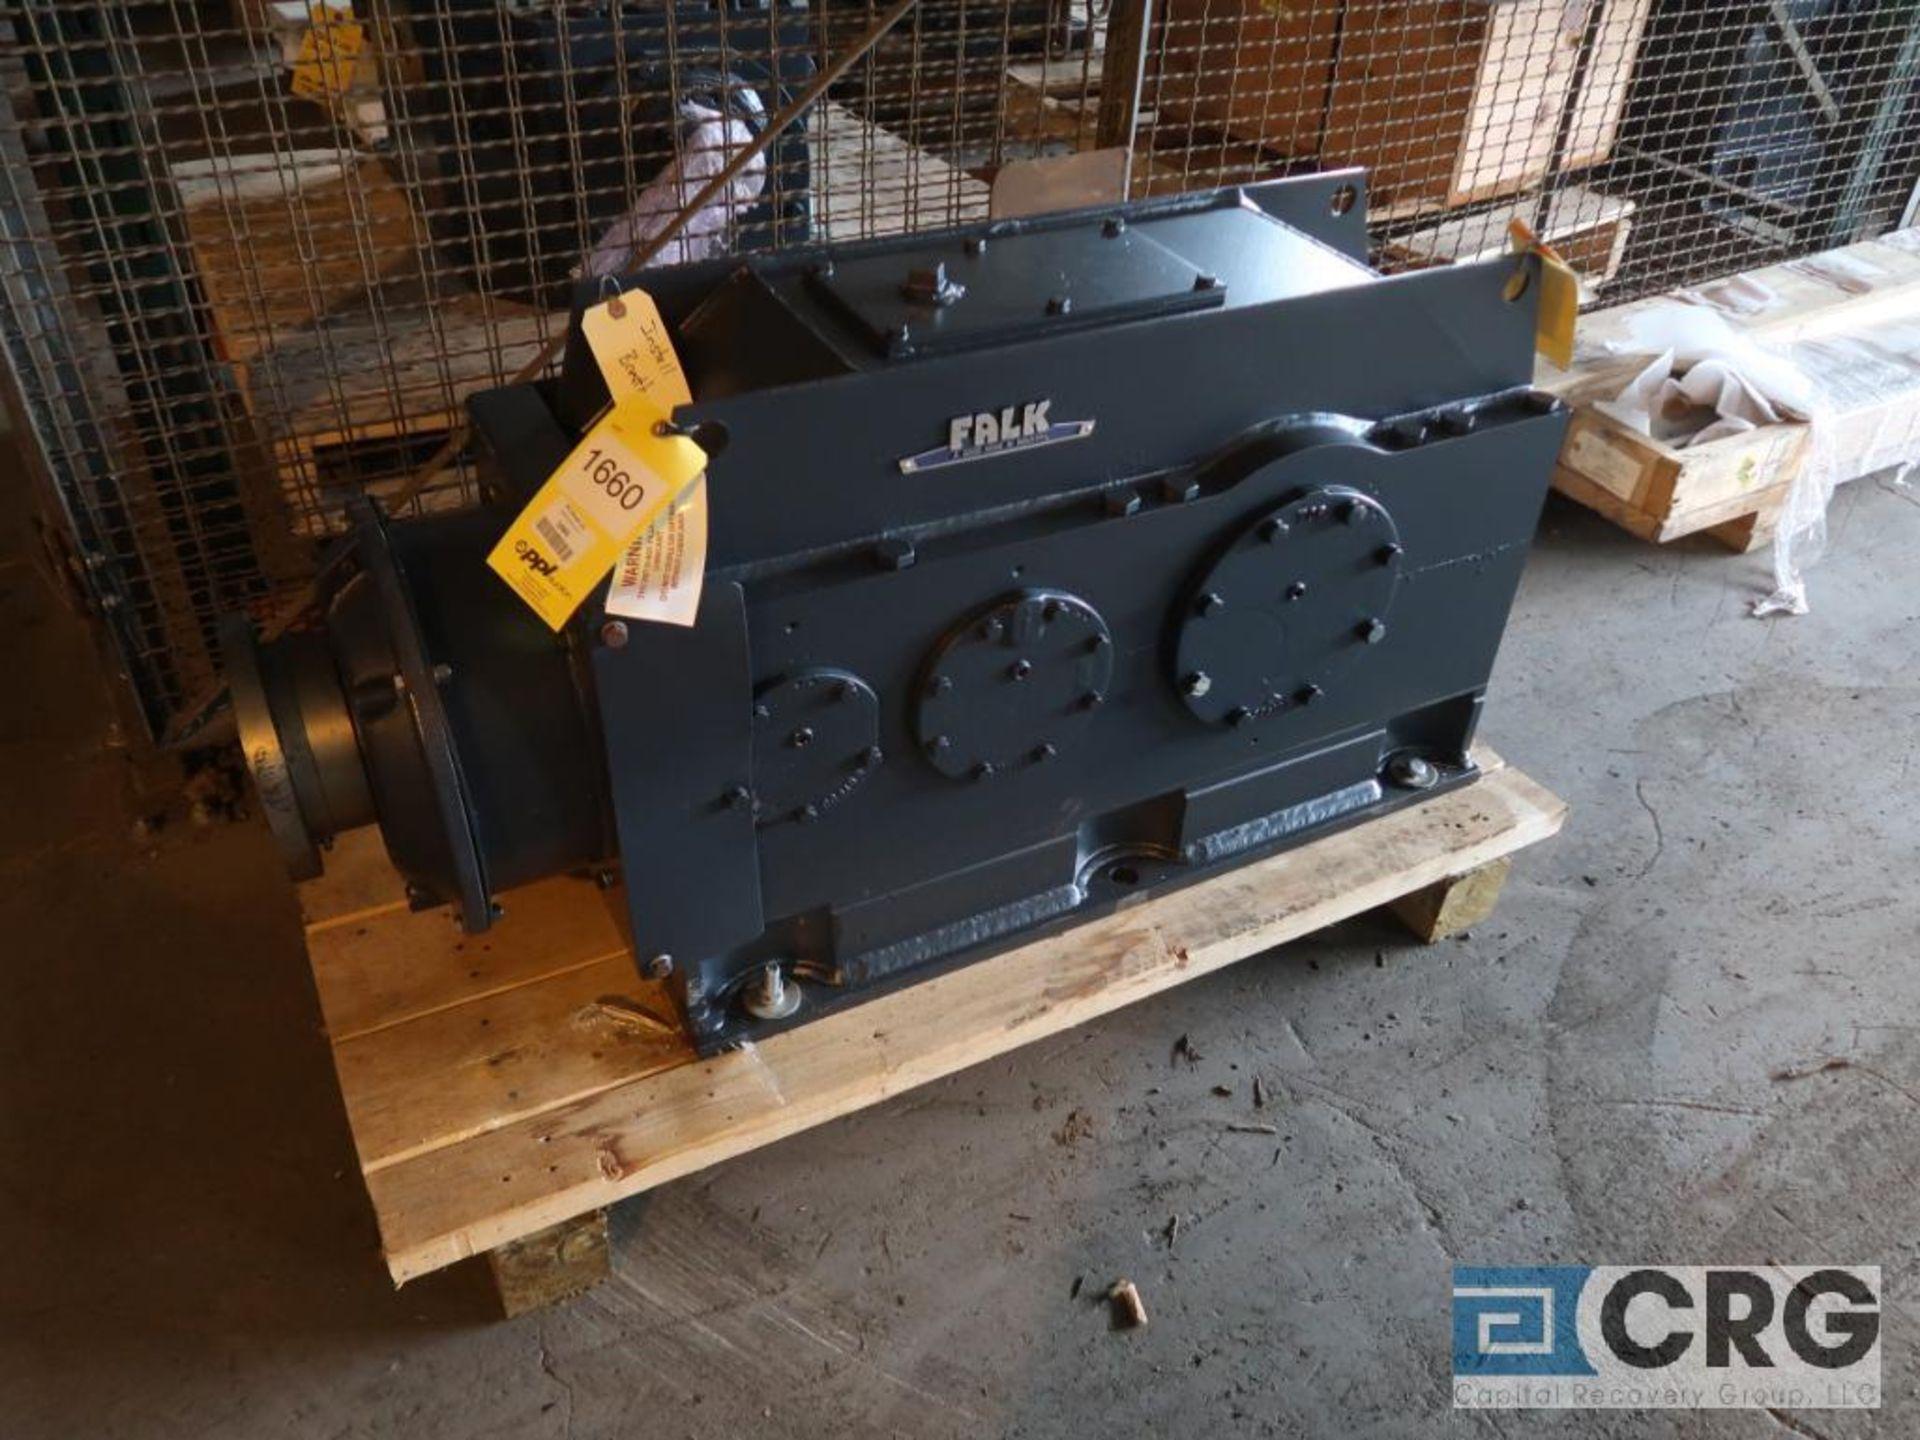 Falk 2080YB2 LB gear drive, ration-5.678, input RPM 1,800, output RPM 317, service rate HP. 125, s/n